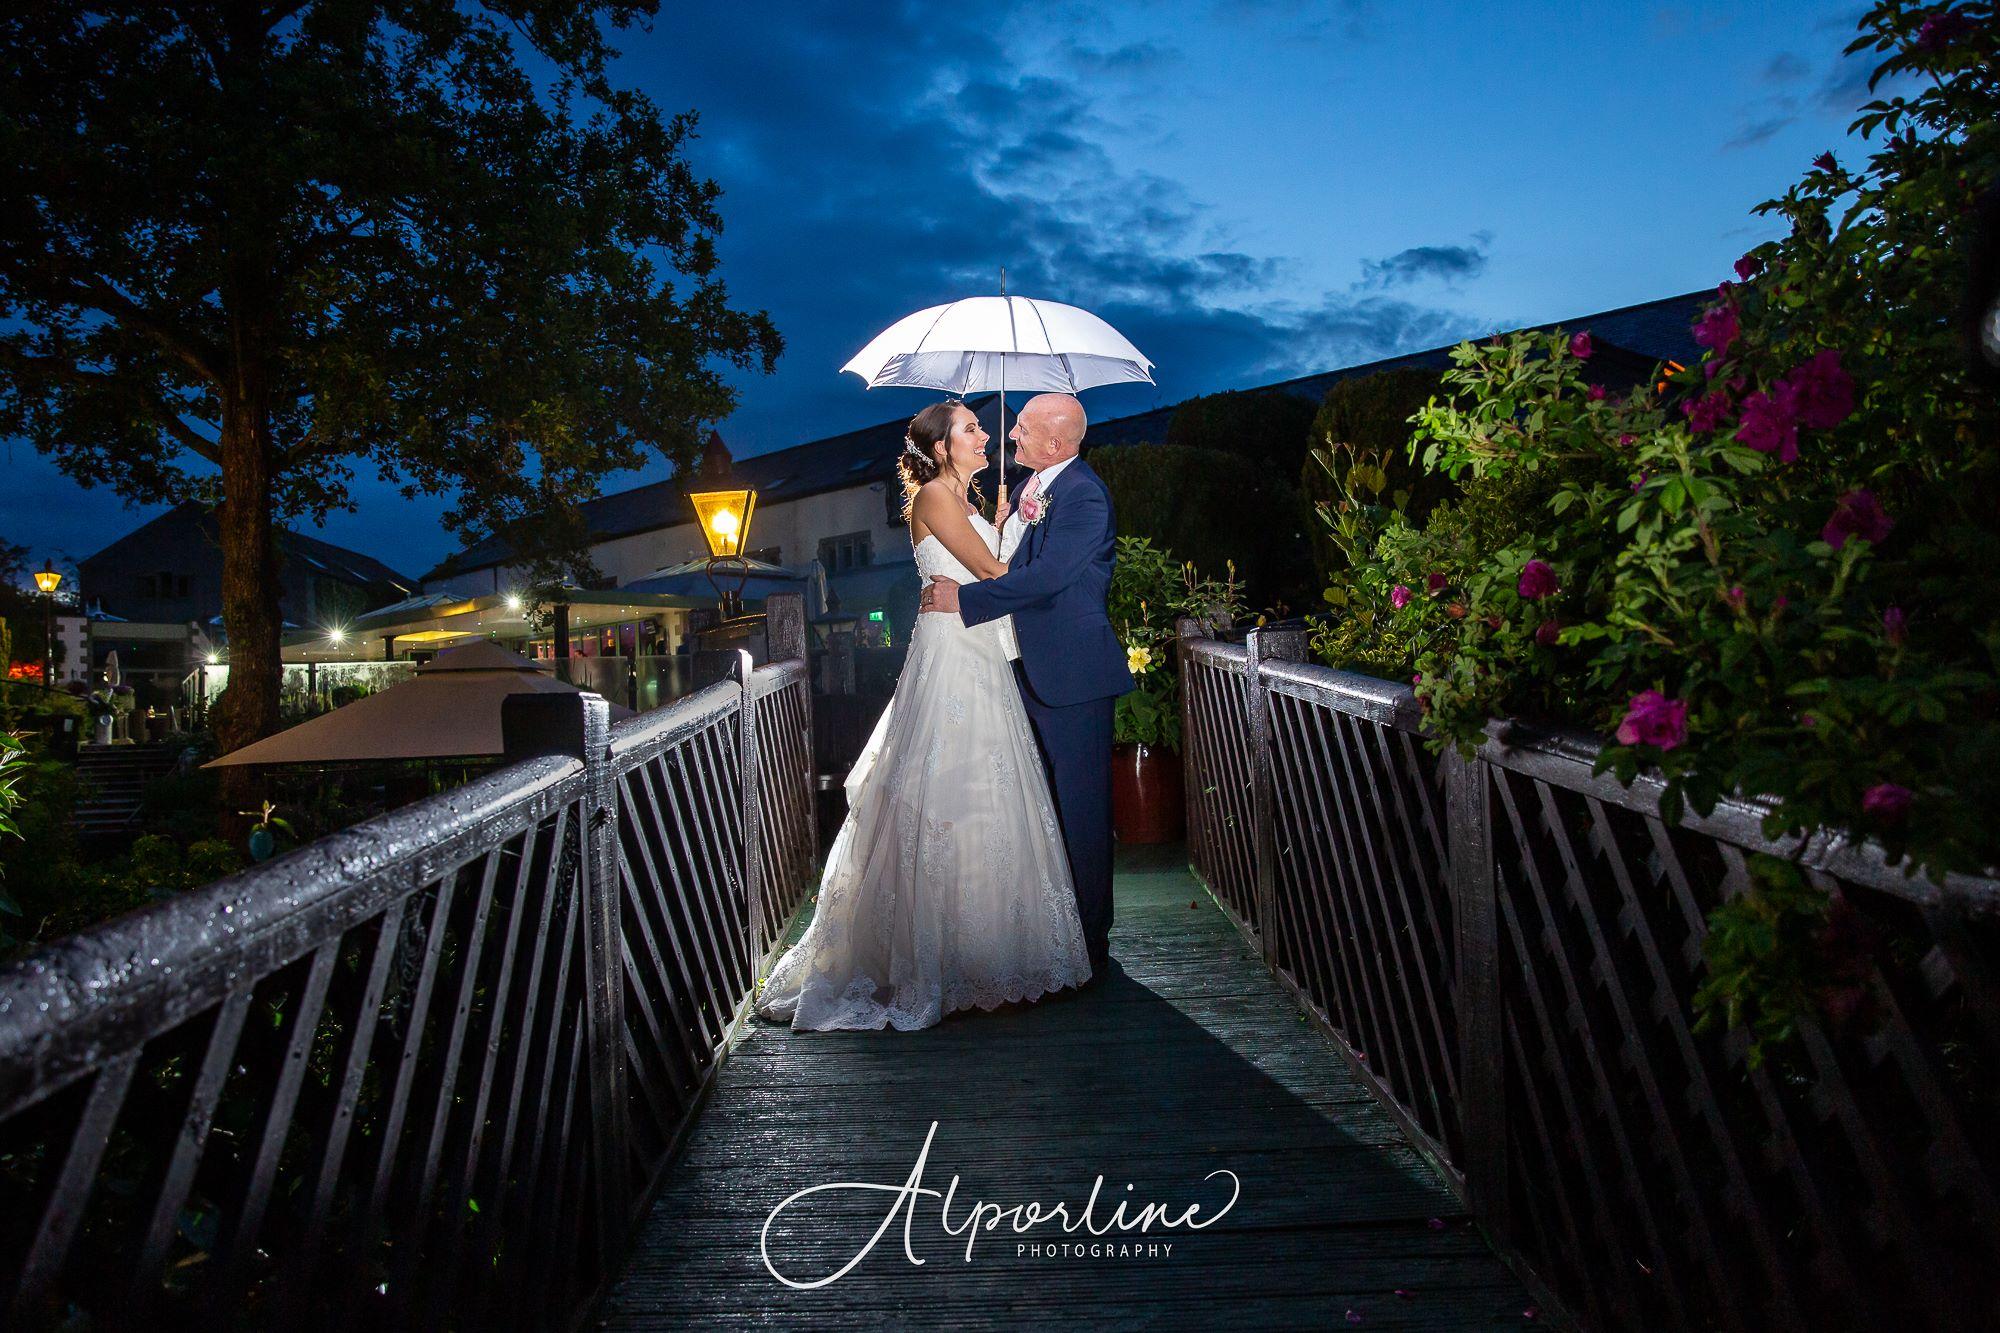 Gibbon-bridge-wedding-photograph-chipping-wedding-photographer.jpg